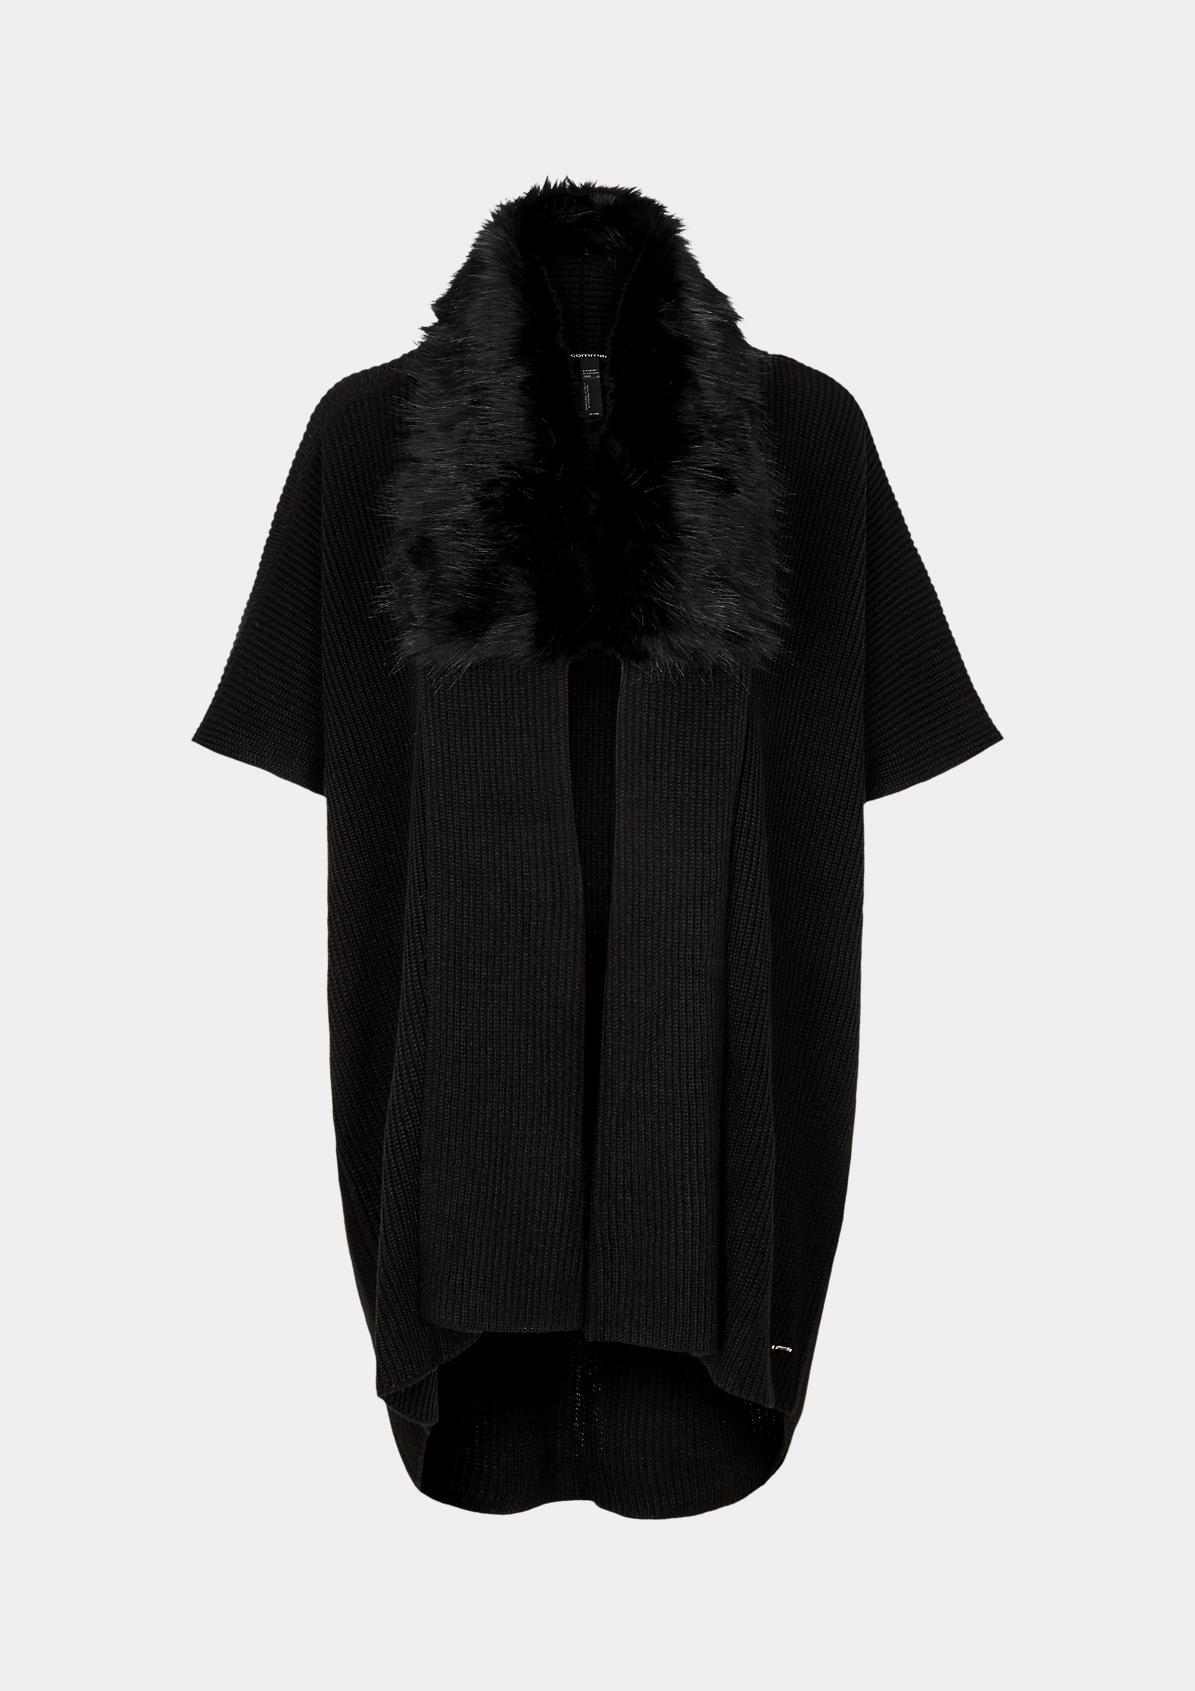 Grobstrickumhang mit Fake-Fur Besatz